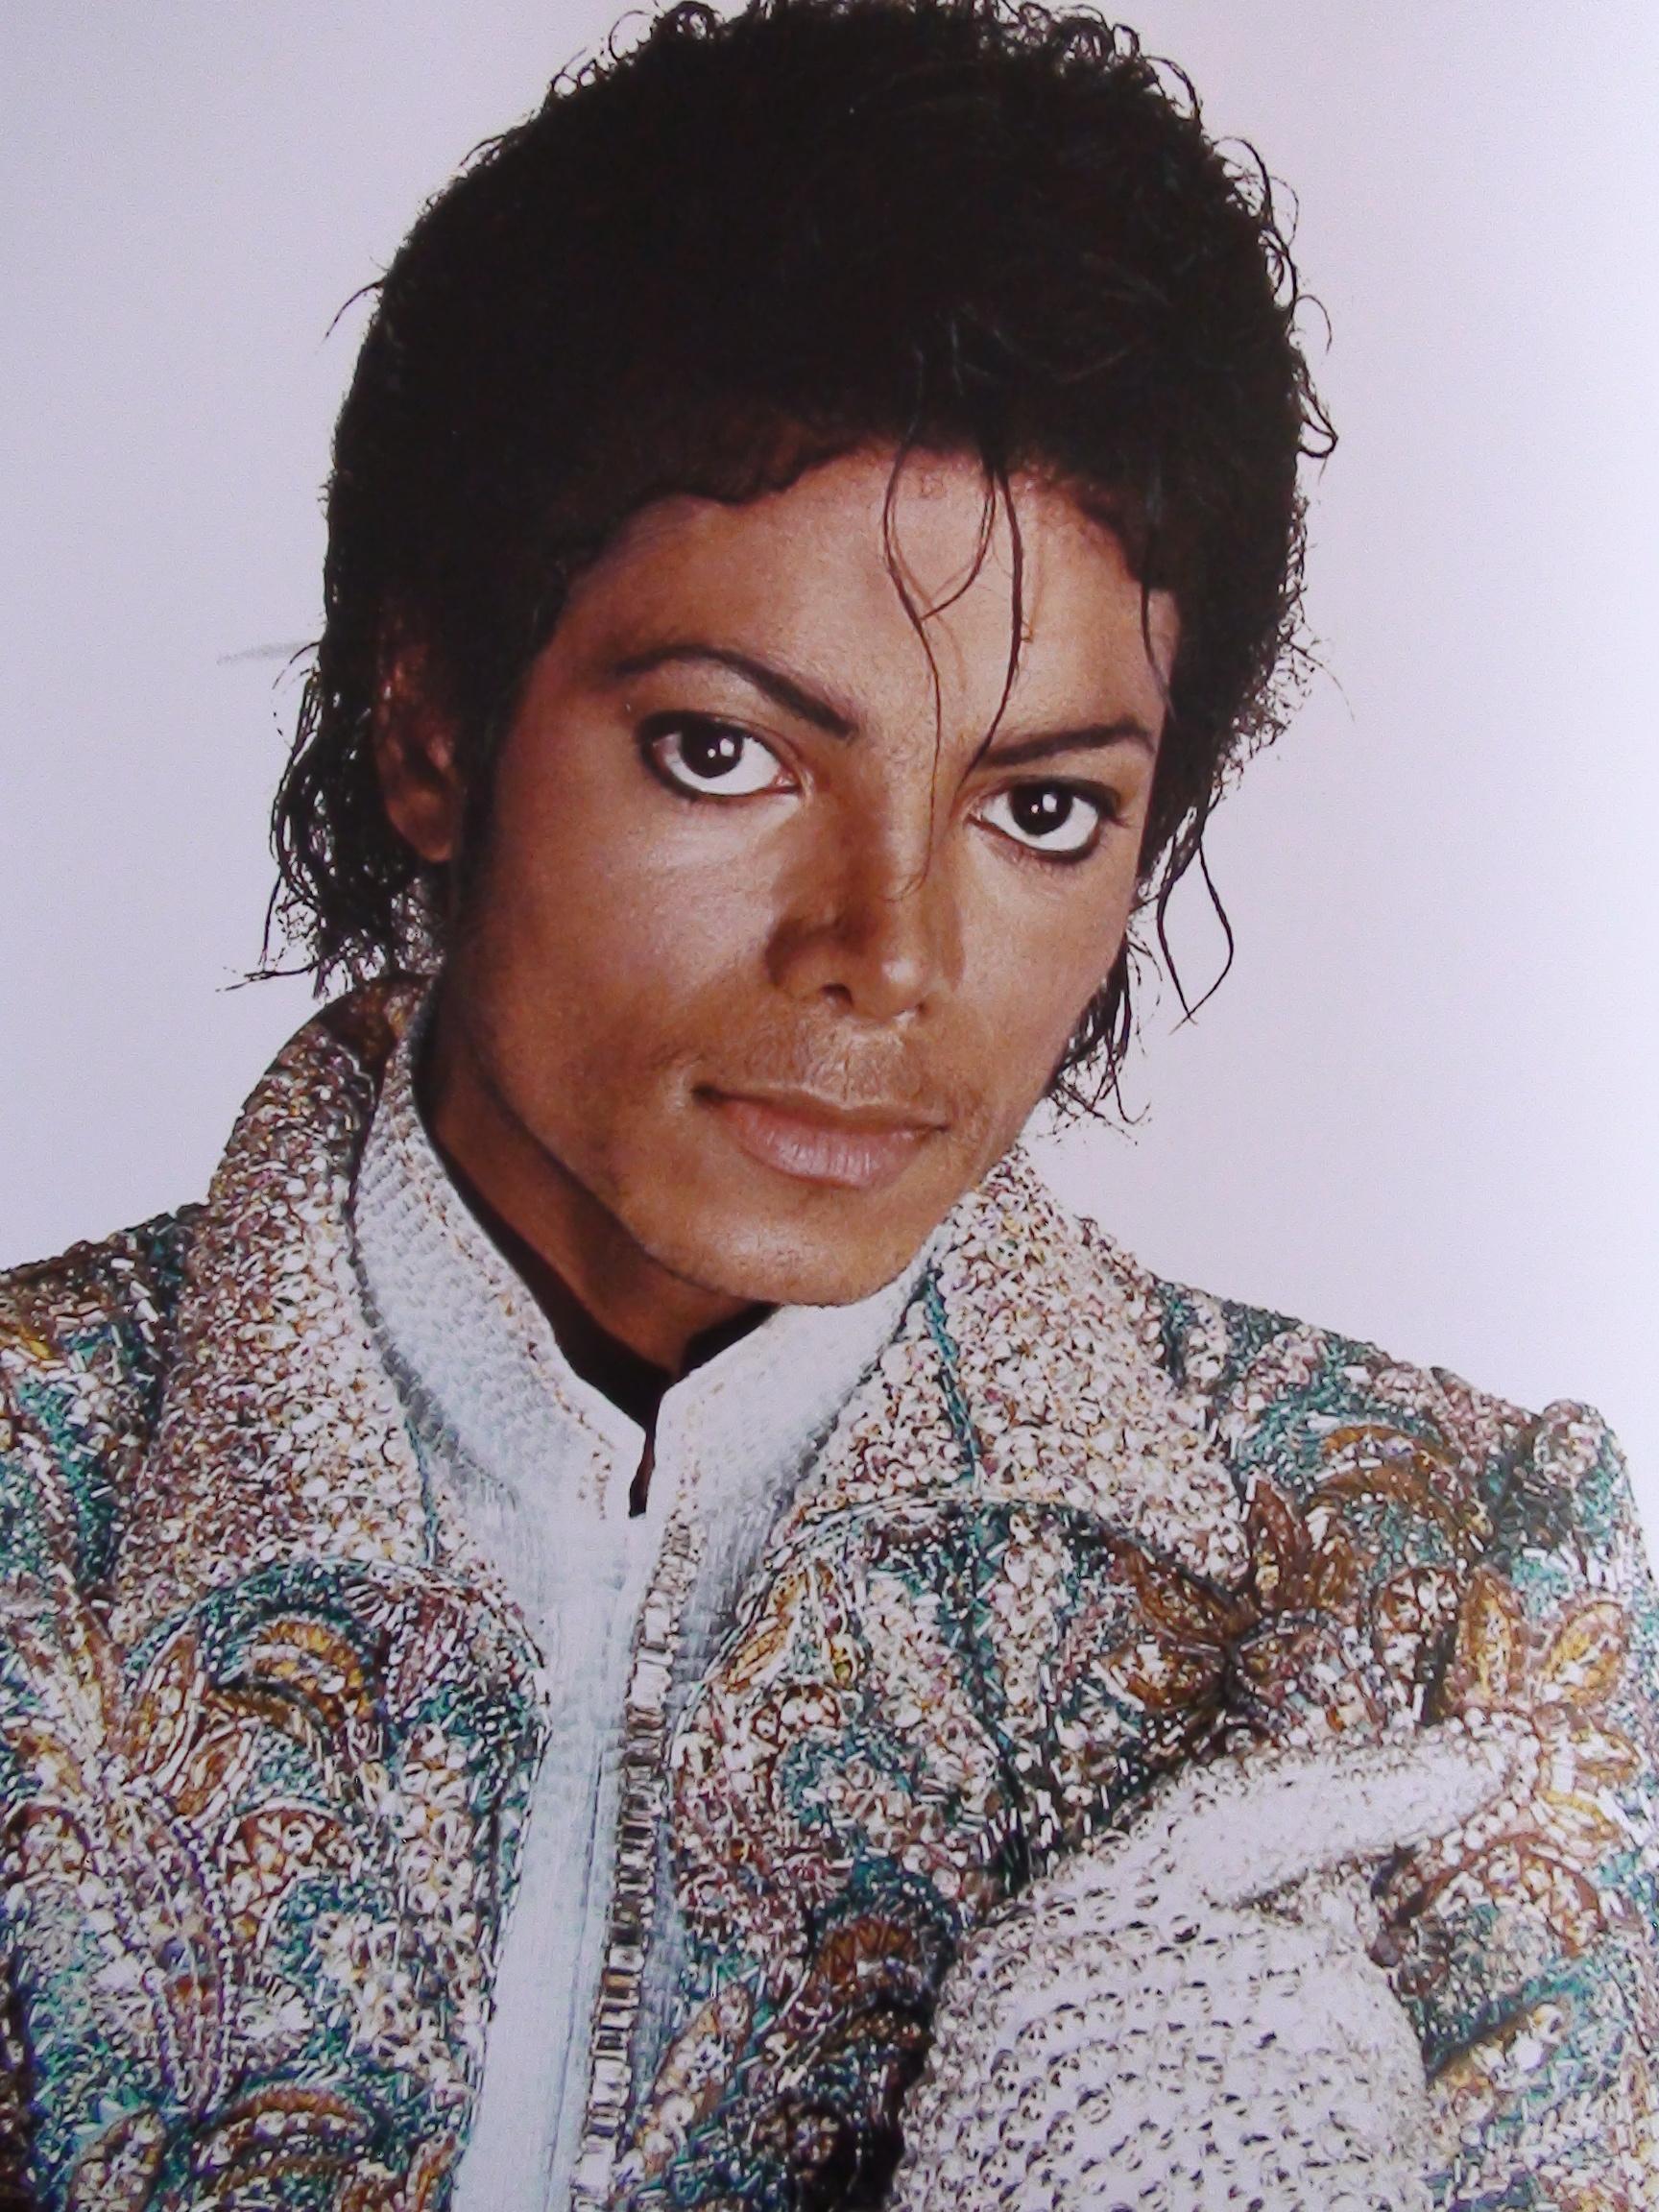 Michael +.+